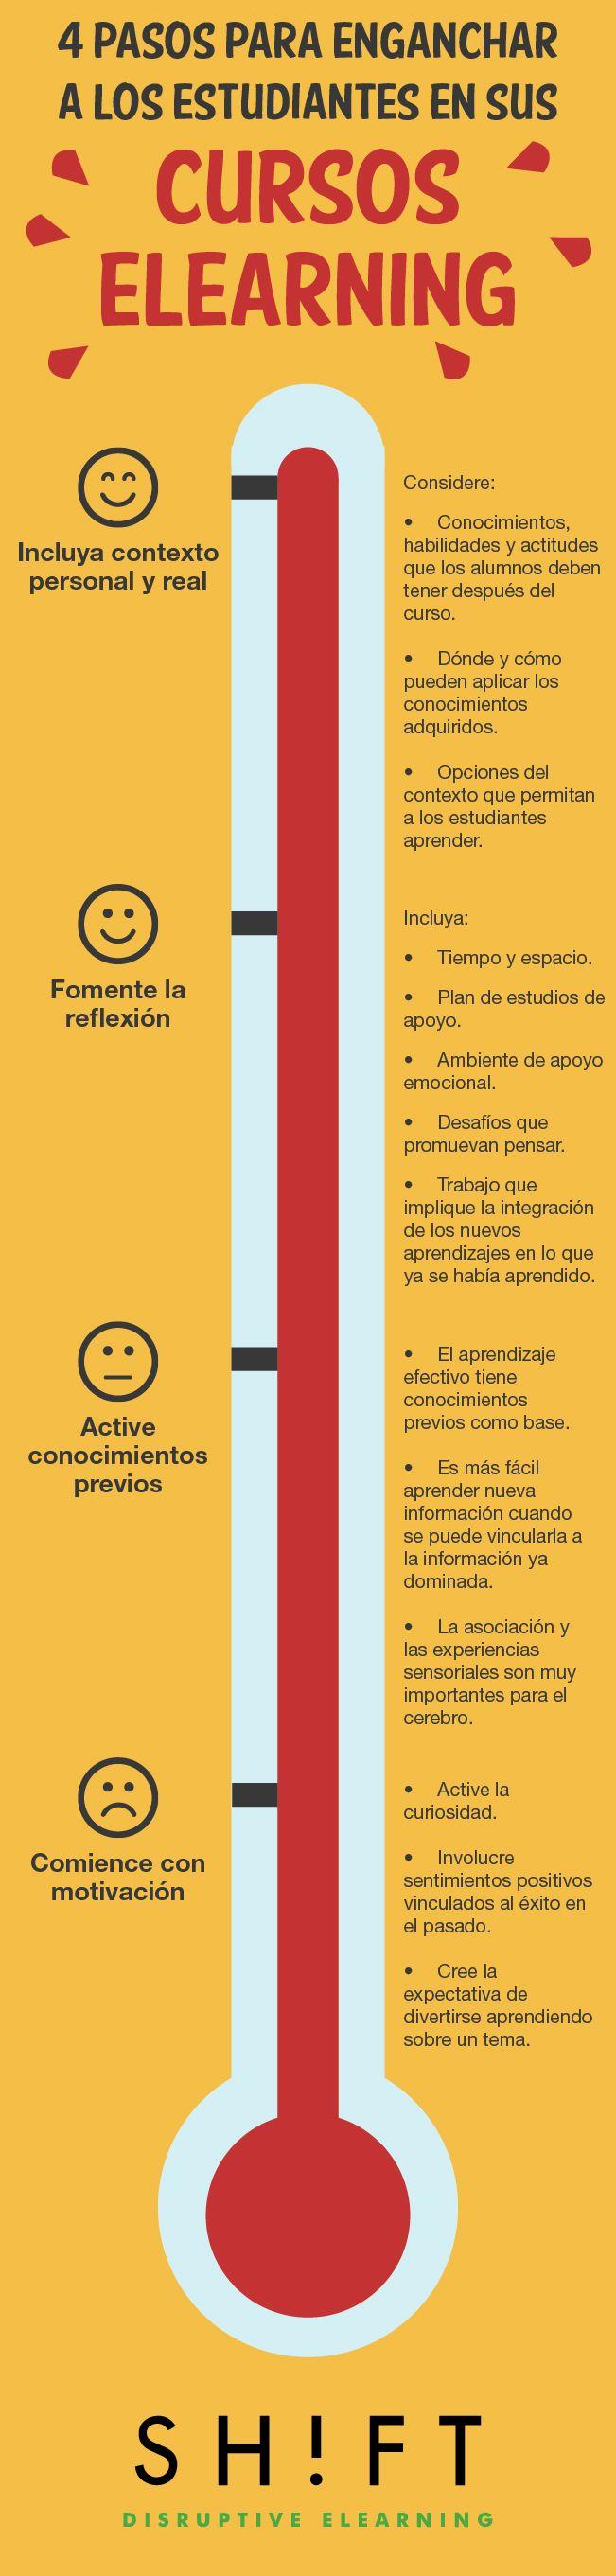 4TipsEngancharAlumnosEnLínea-Infografía-BlogGesvin